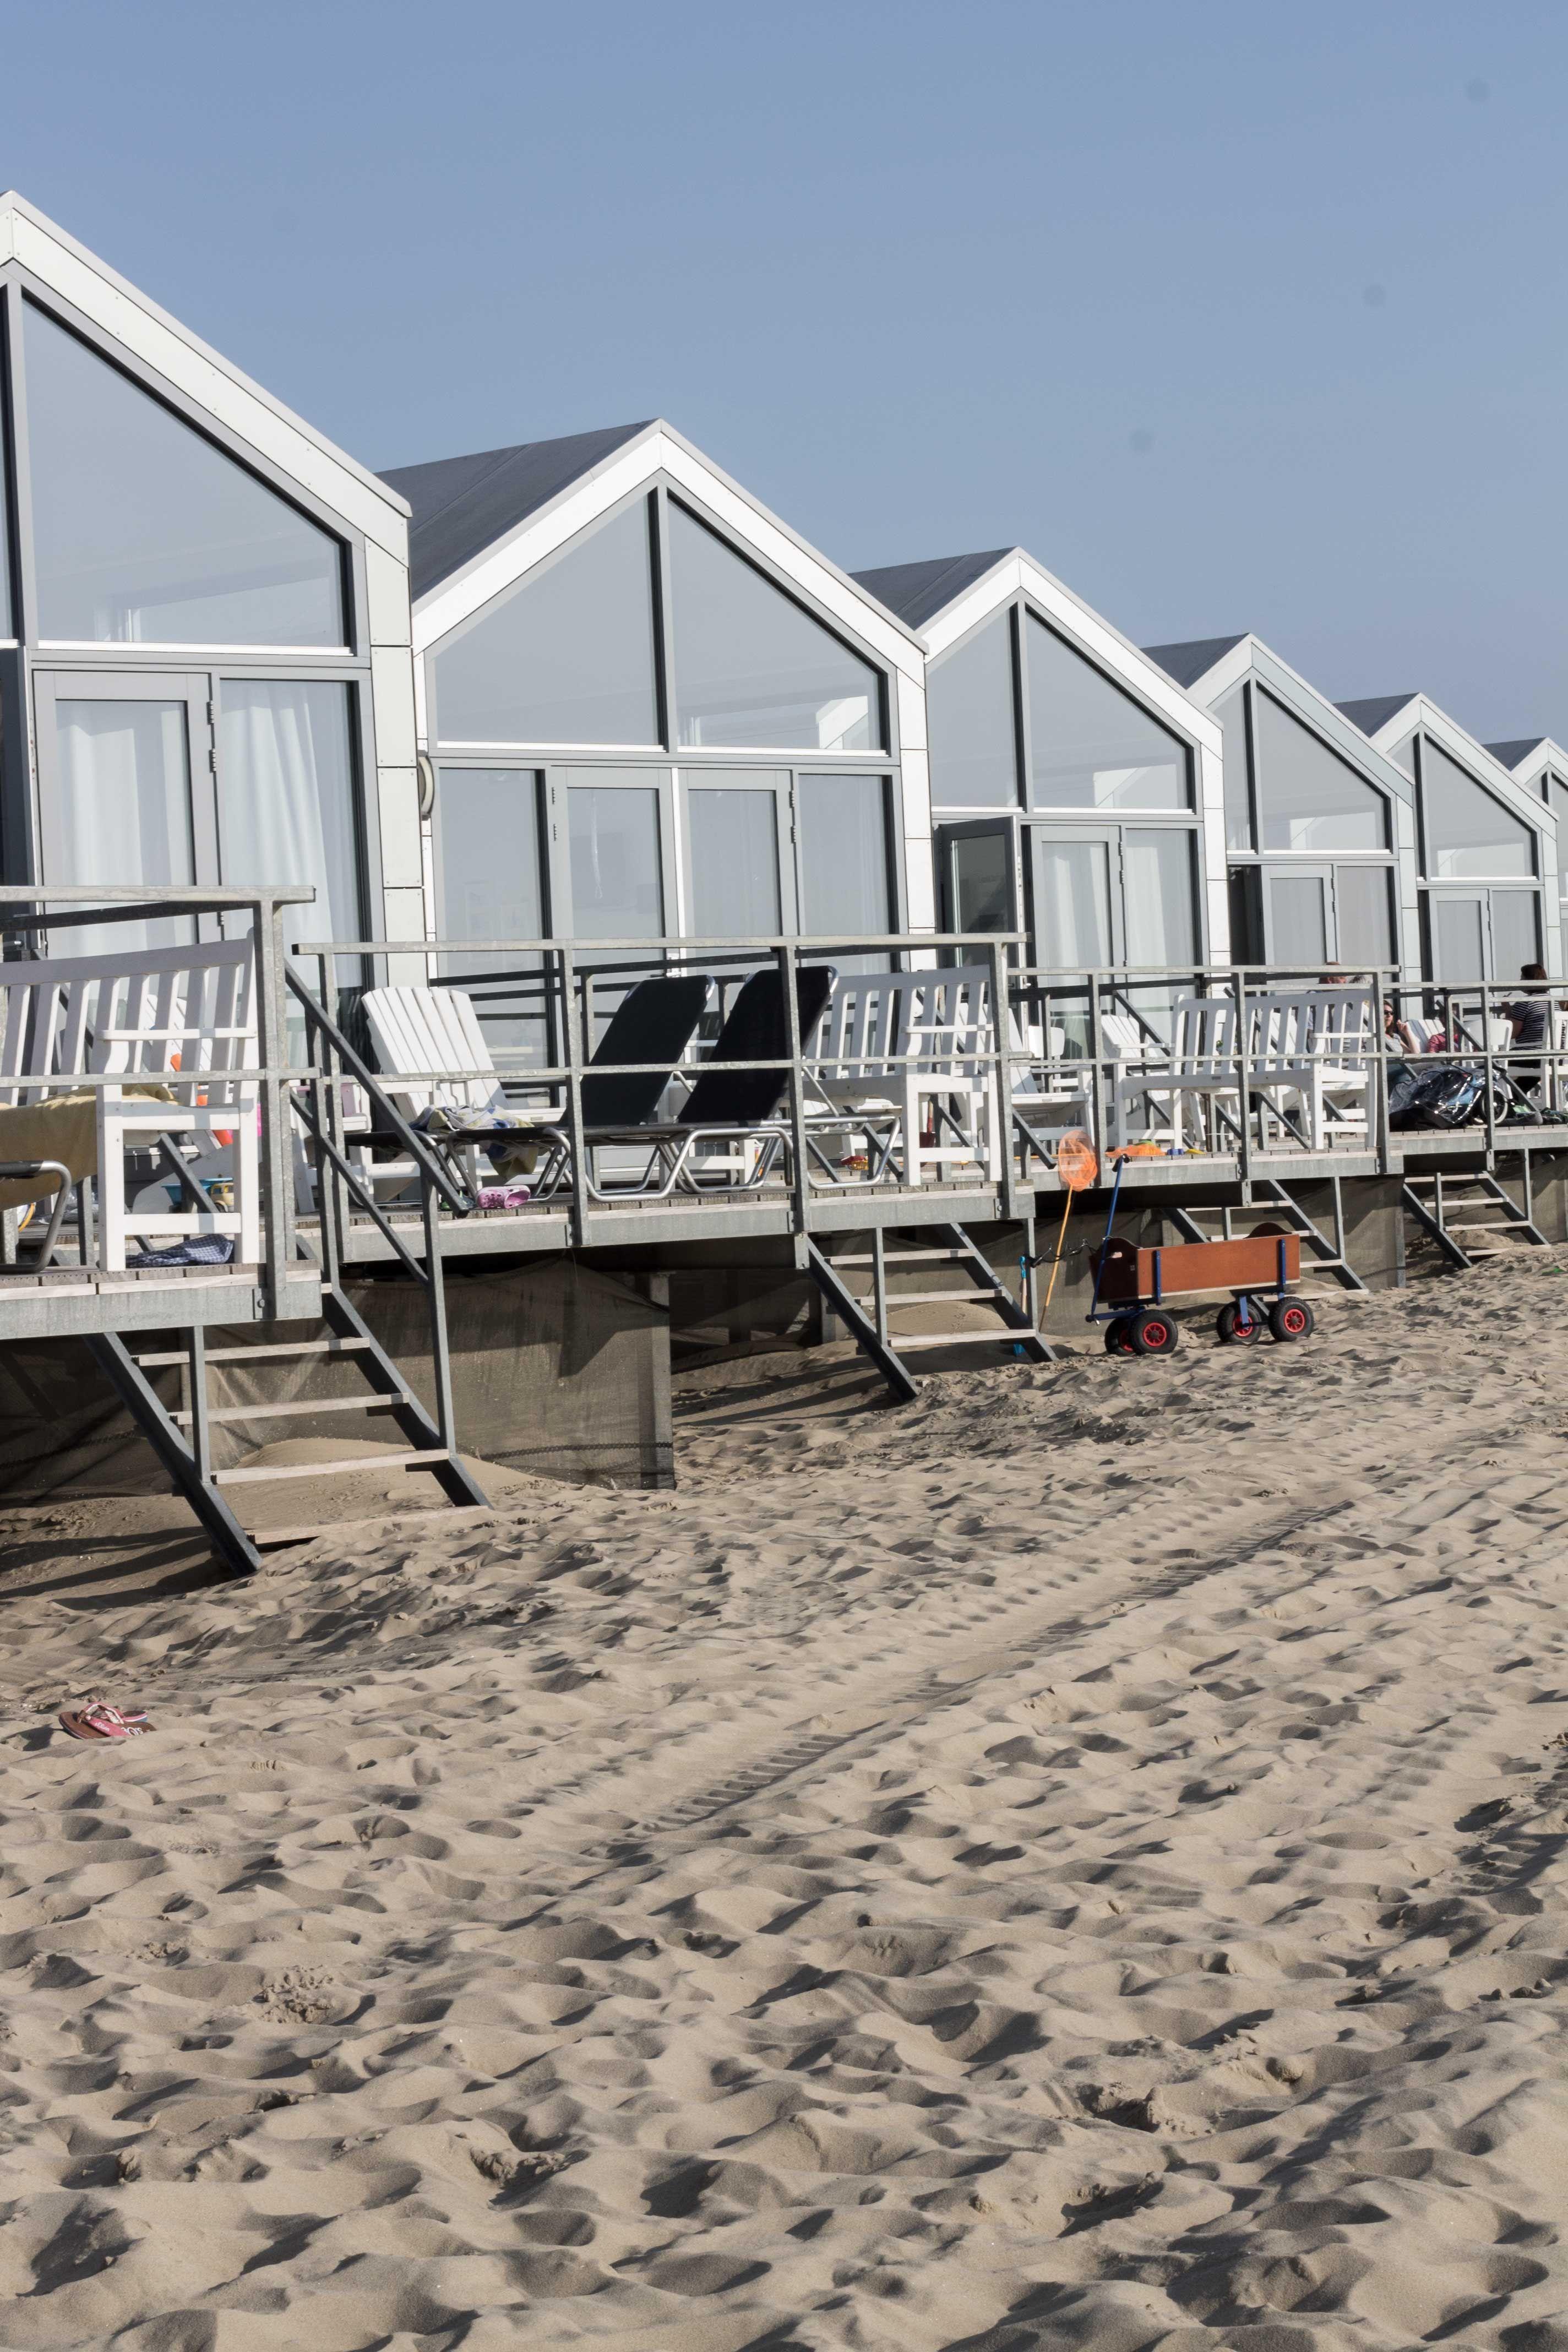 Strandhäuser in Julianadorp - Holland #beachhouse